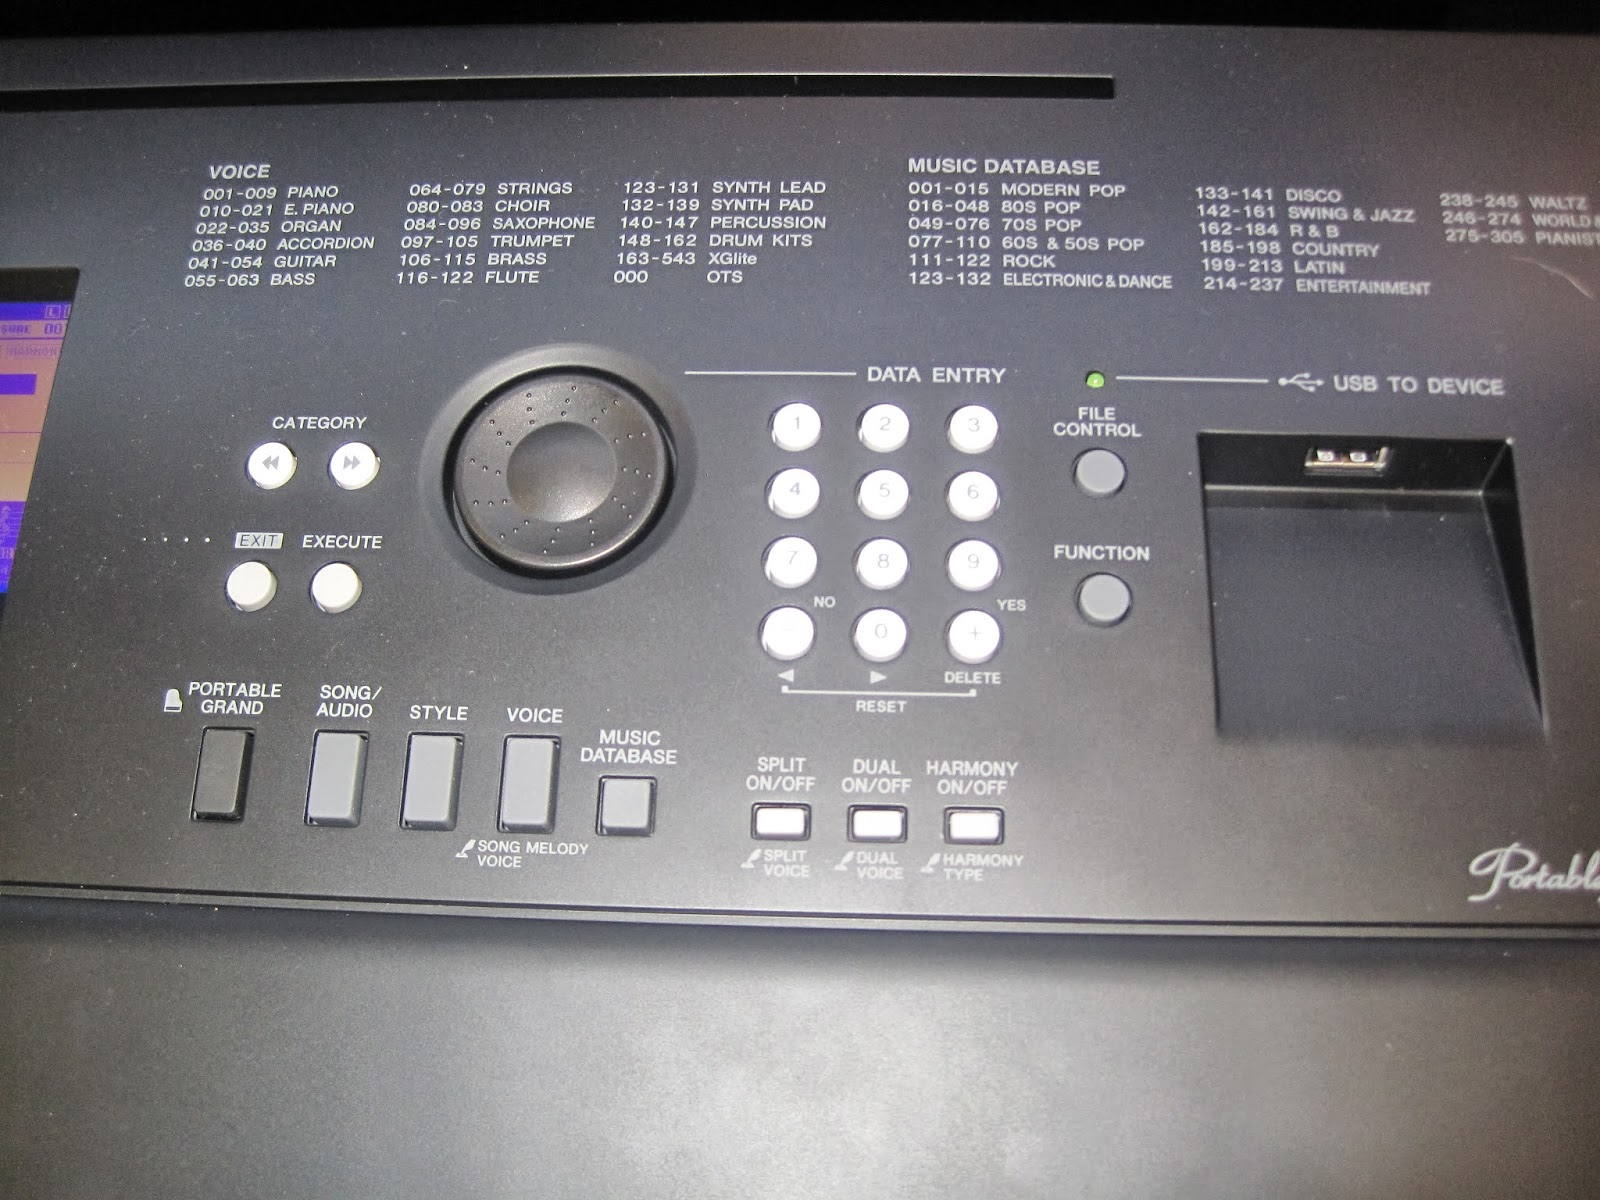 AZ PIANO REVIEWS: REVIEW - Yamaha DGX650 Digital Piano